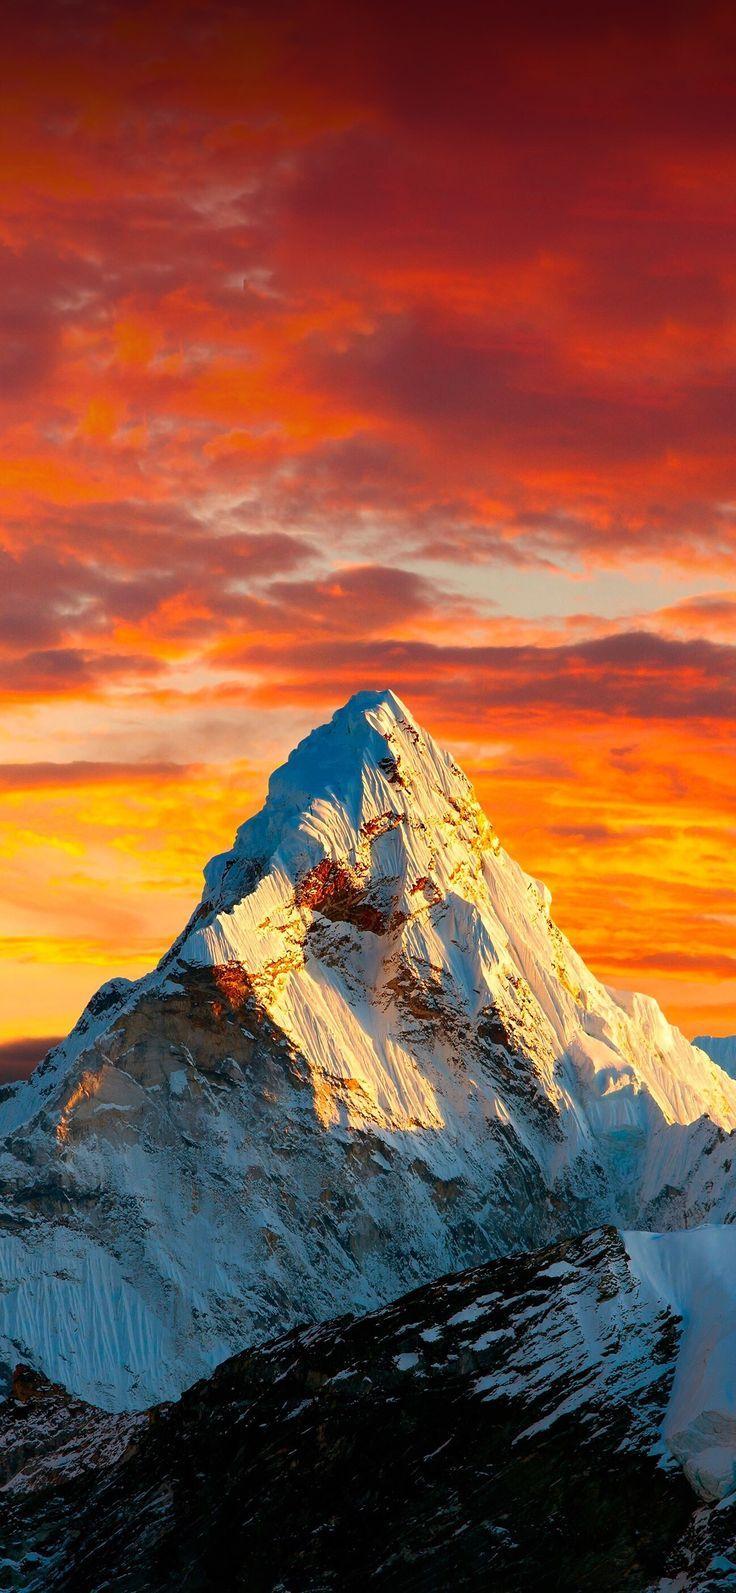 Mountain Orange Sky Beautiful Wallpapers Mountain Wallpaper Nature Wallpaper